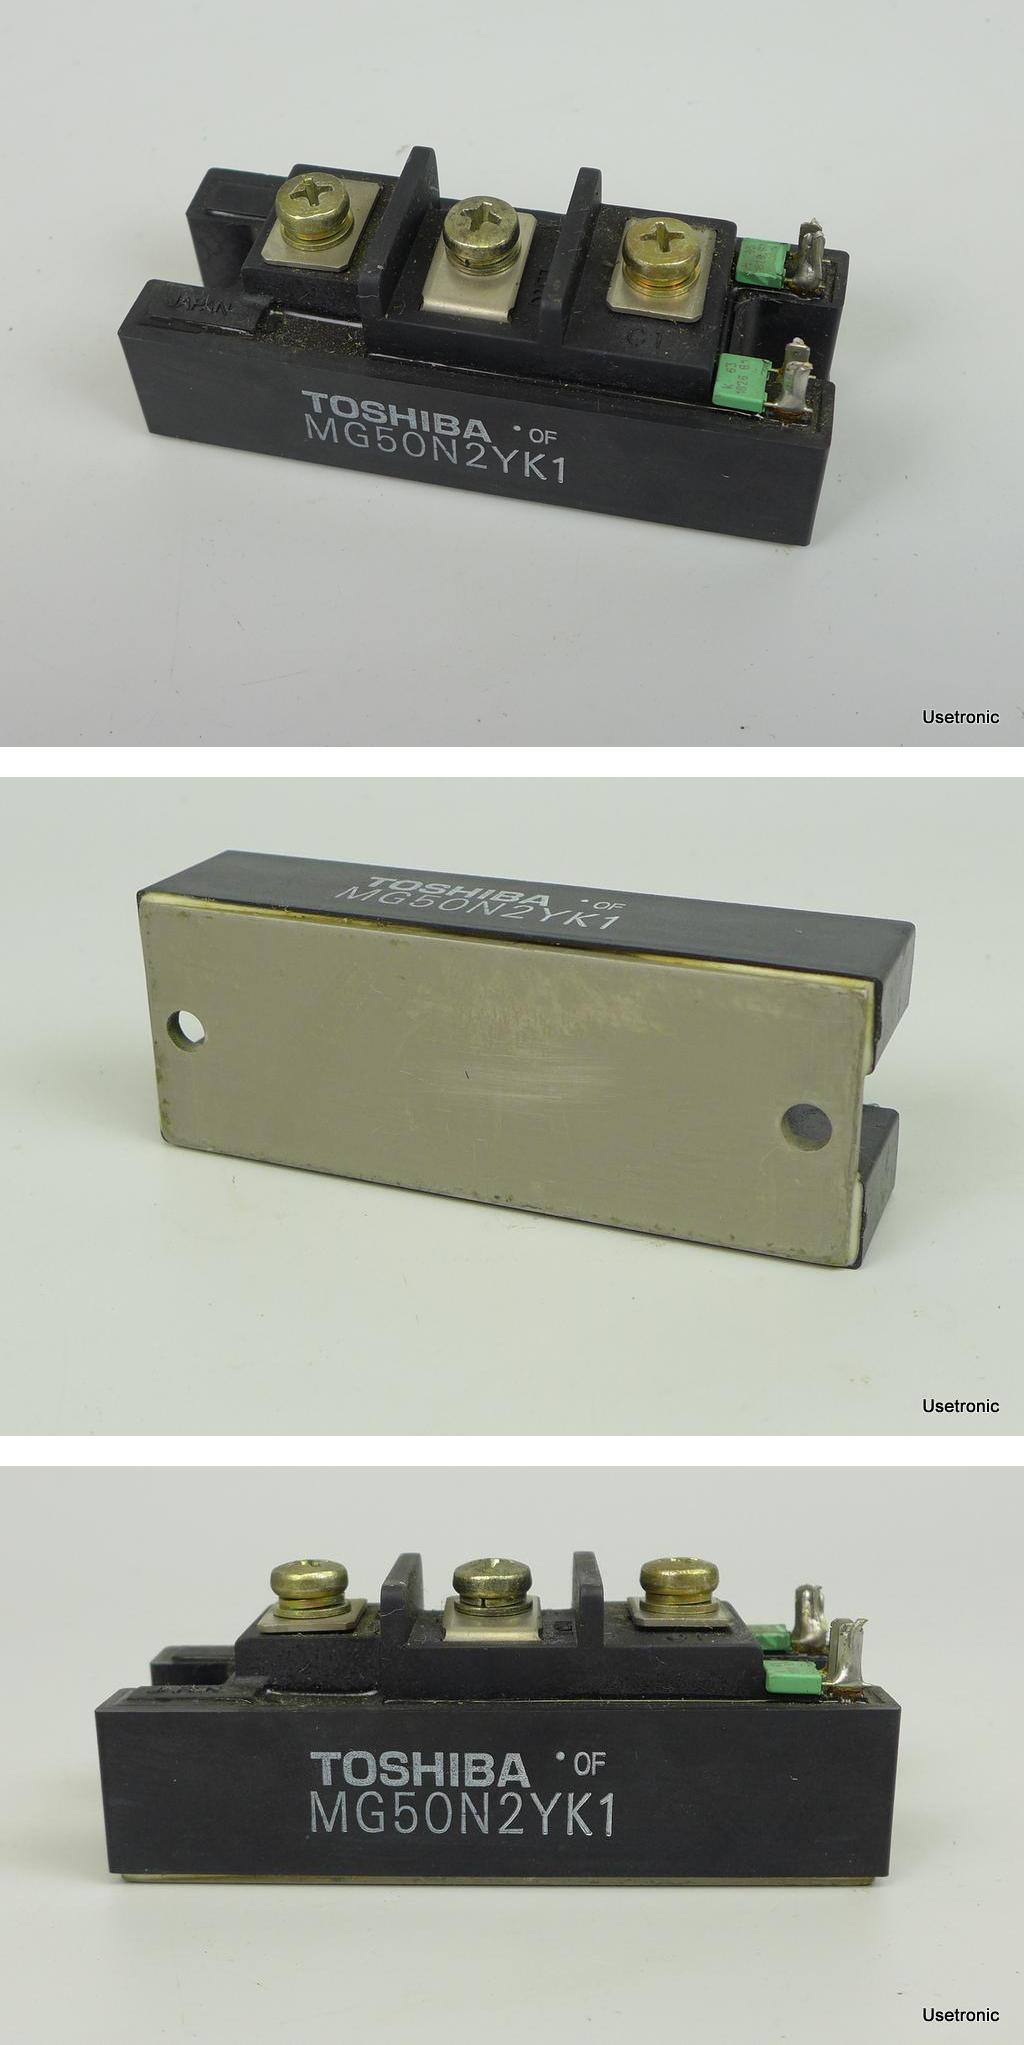 Toshiba MG50N2YK1